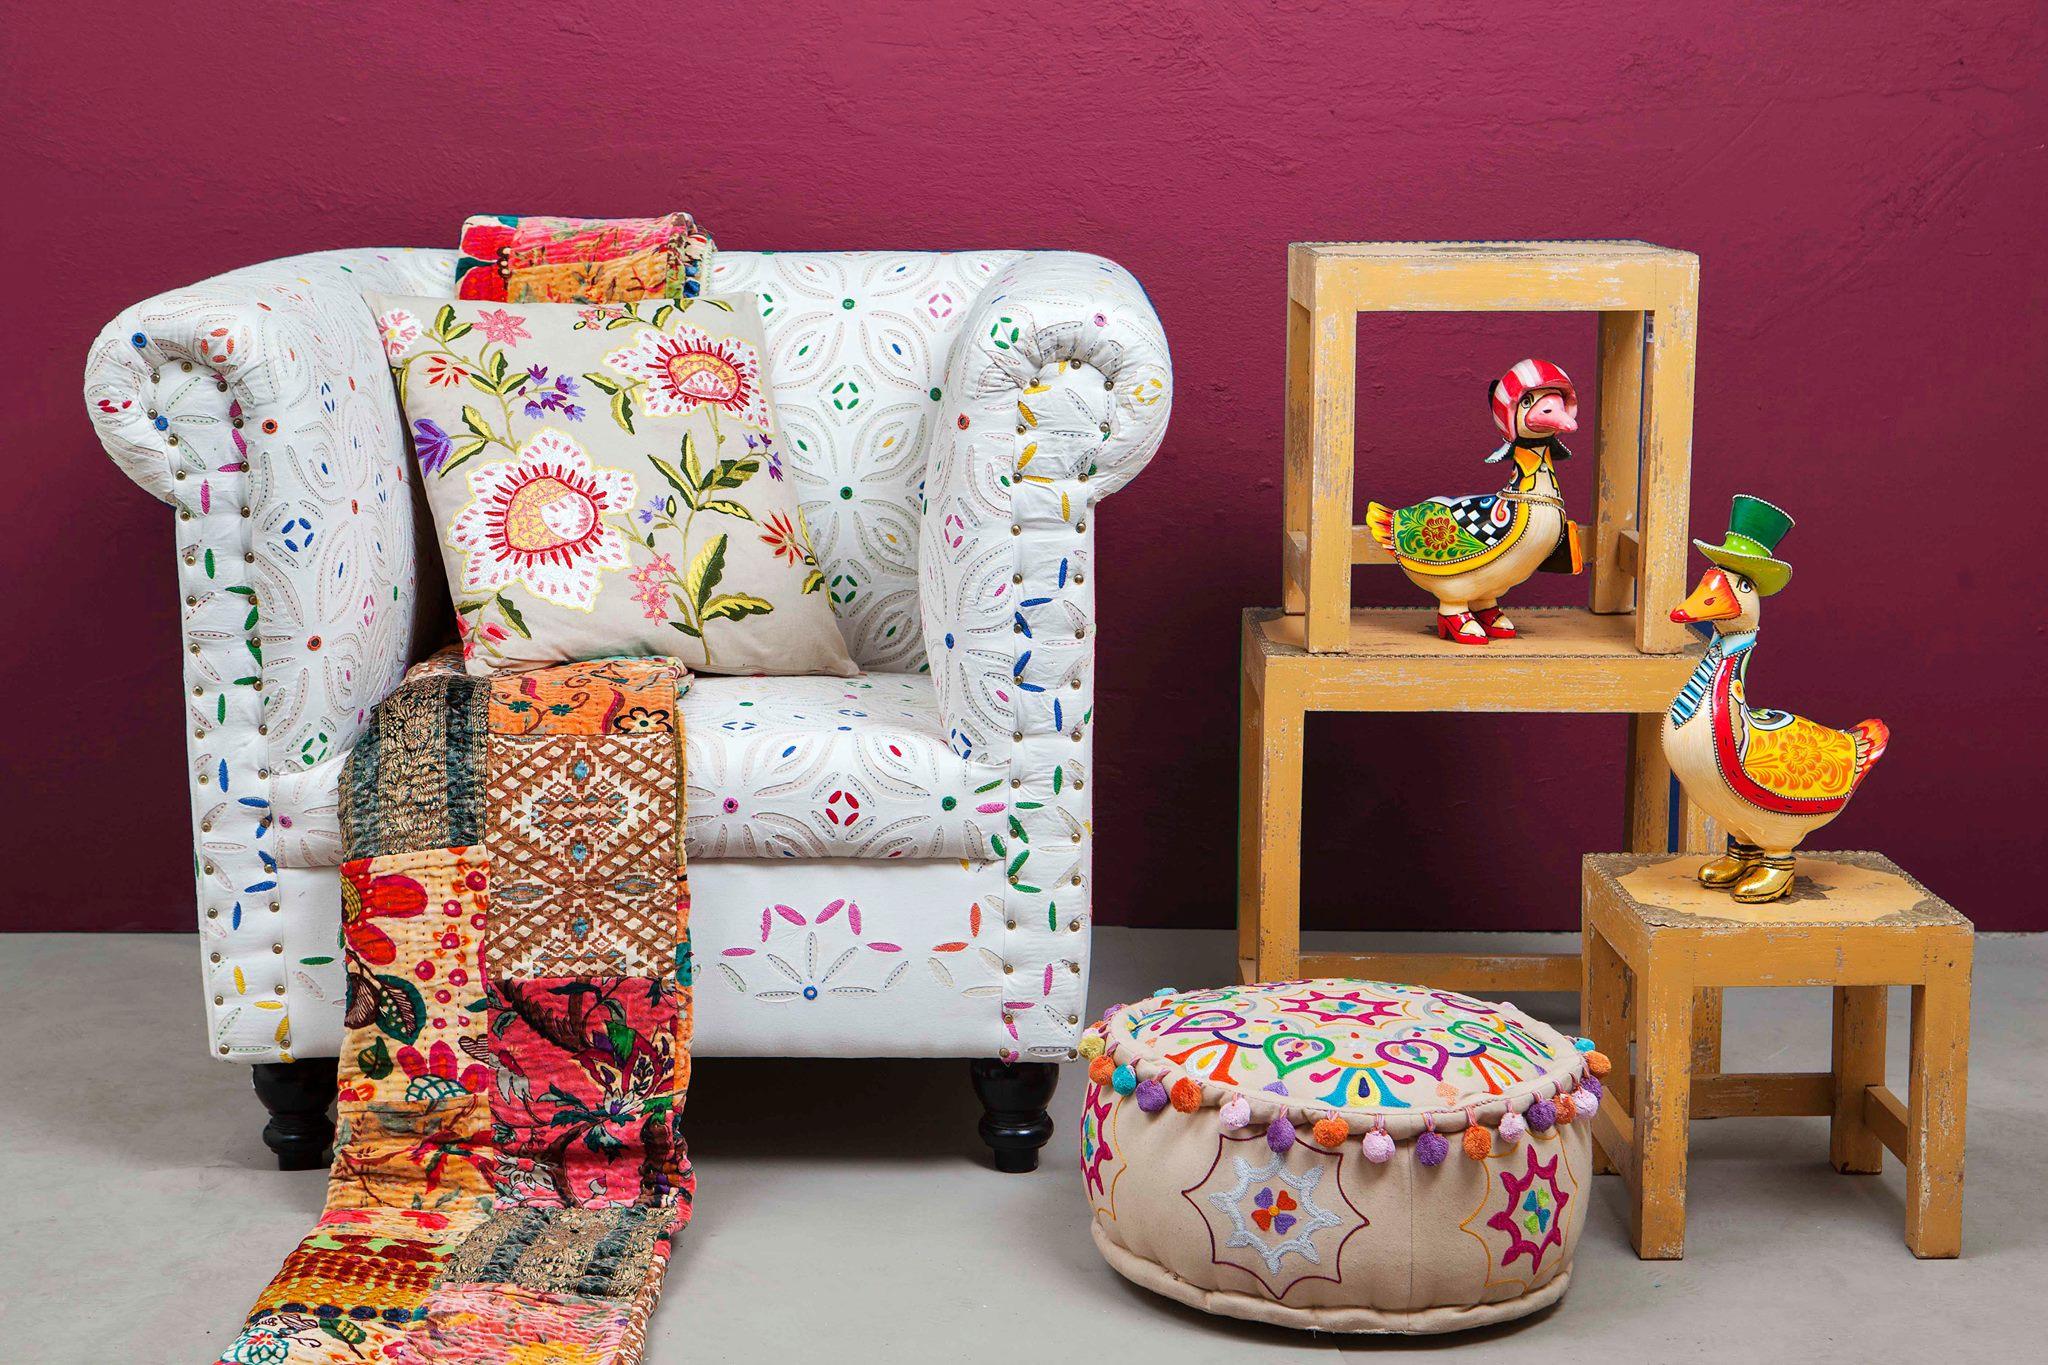 Haveli la tienda de la india en bogot for Almacenes decoracion bogota